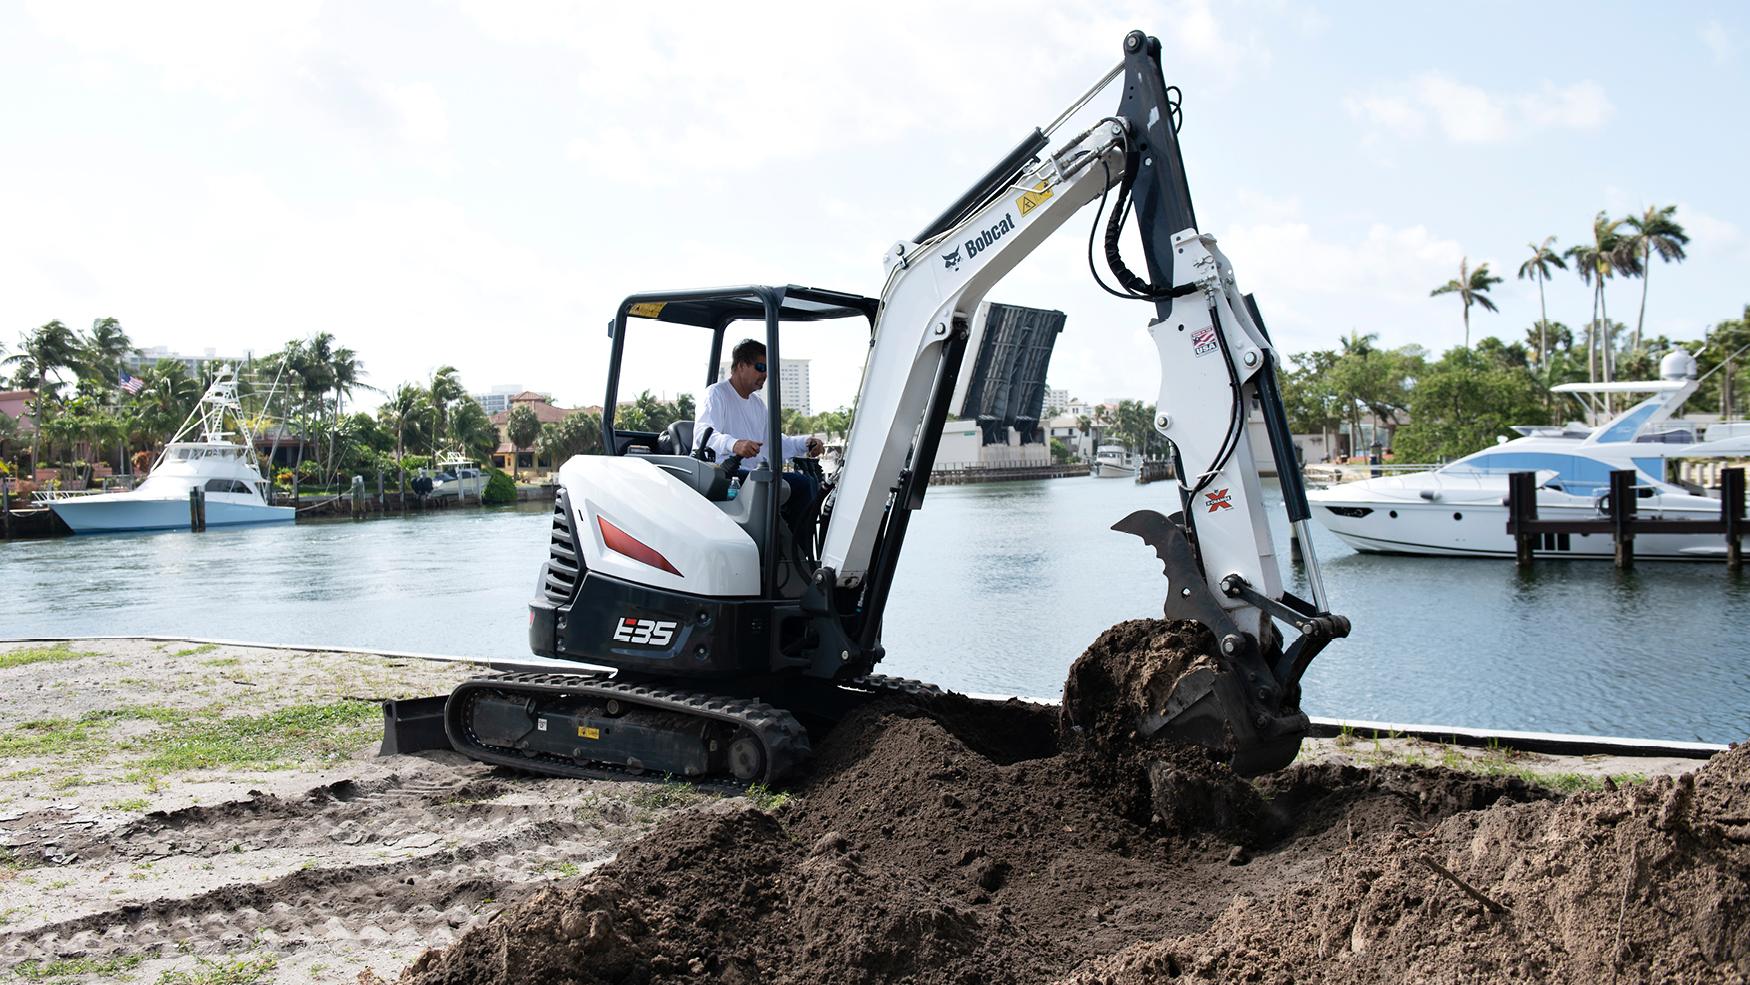 Digging Canalside with a Bobcat mini excavator | Bobcat Blog